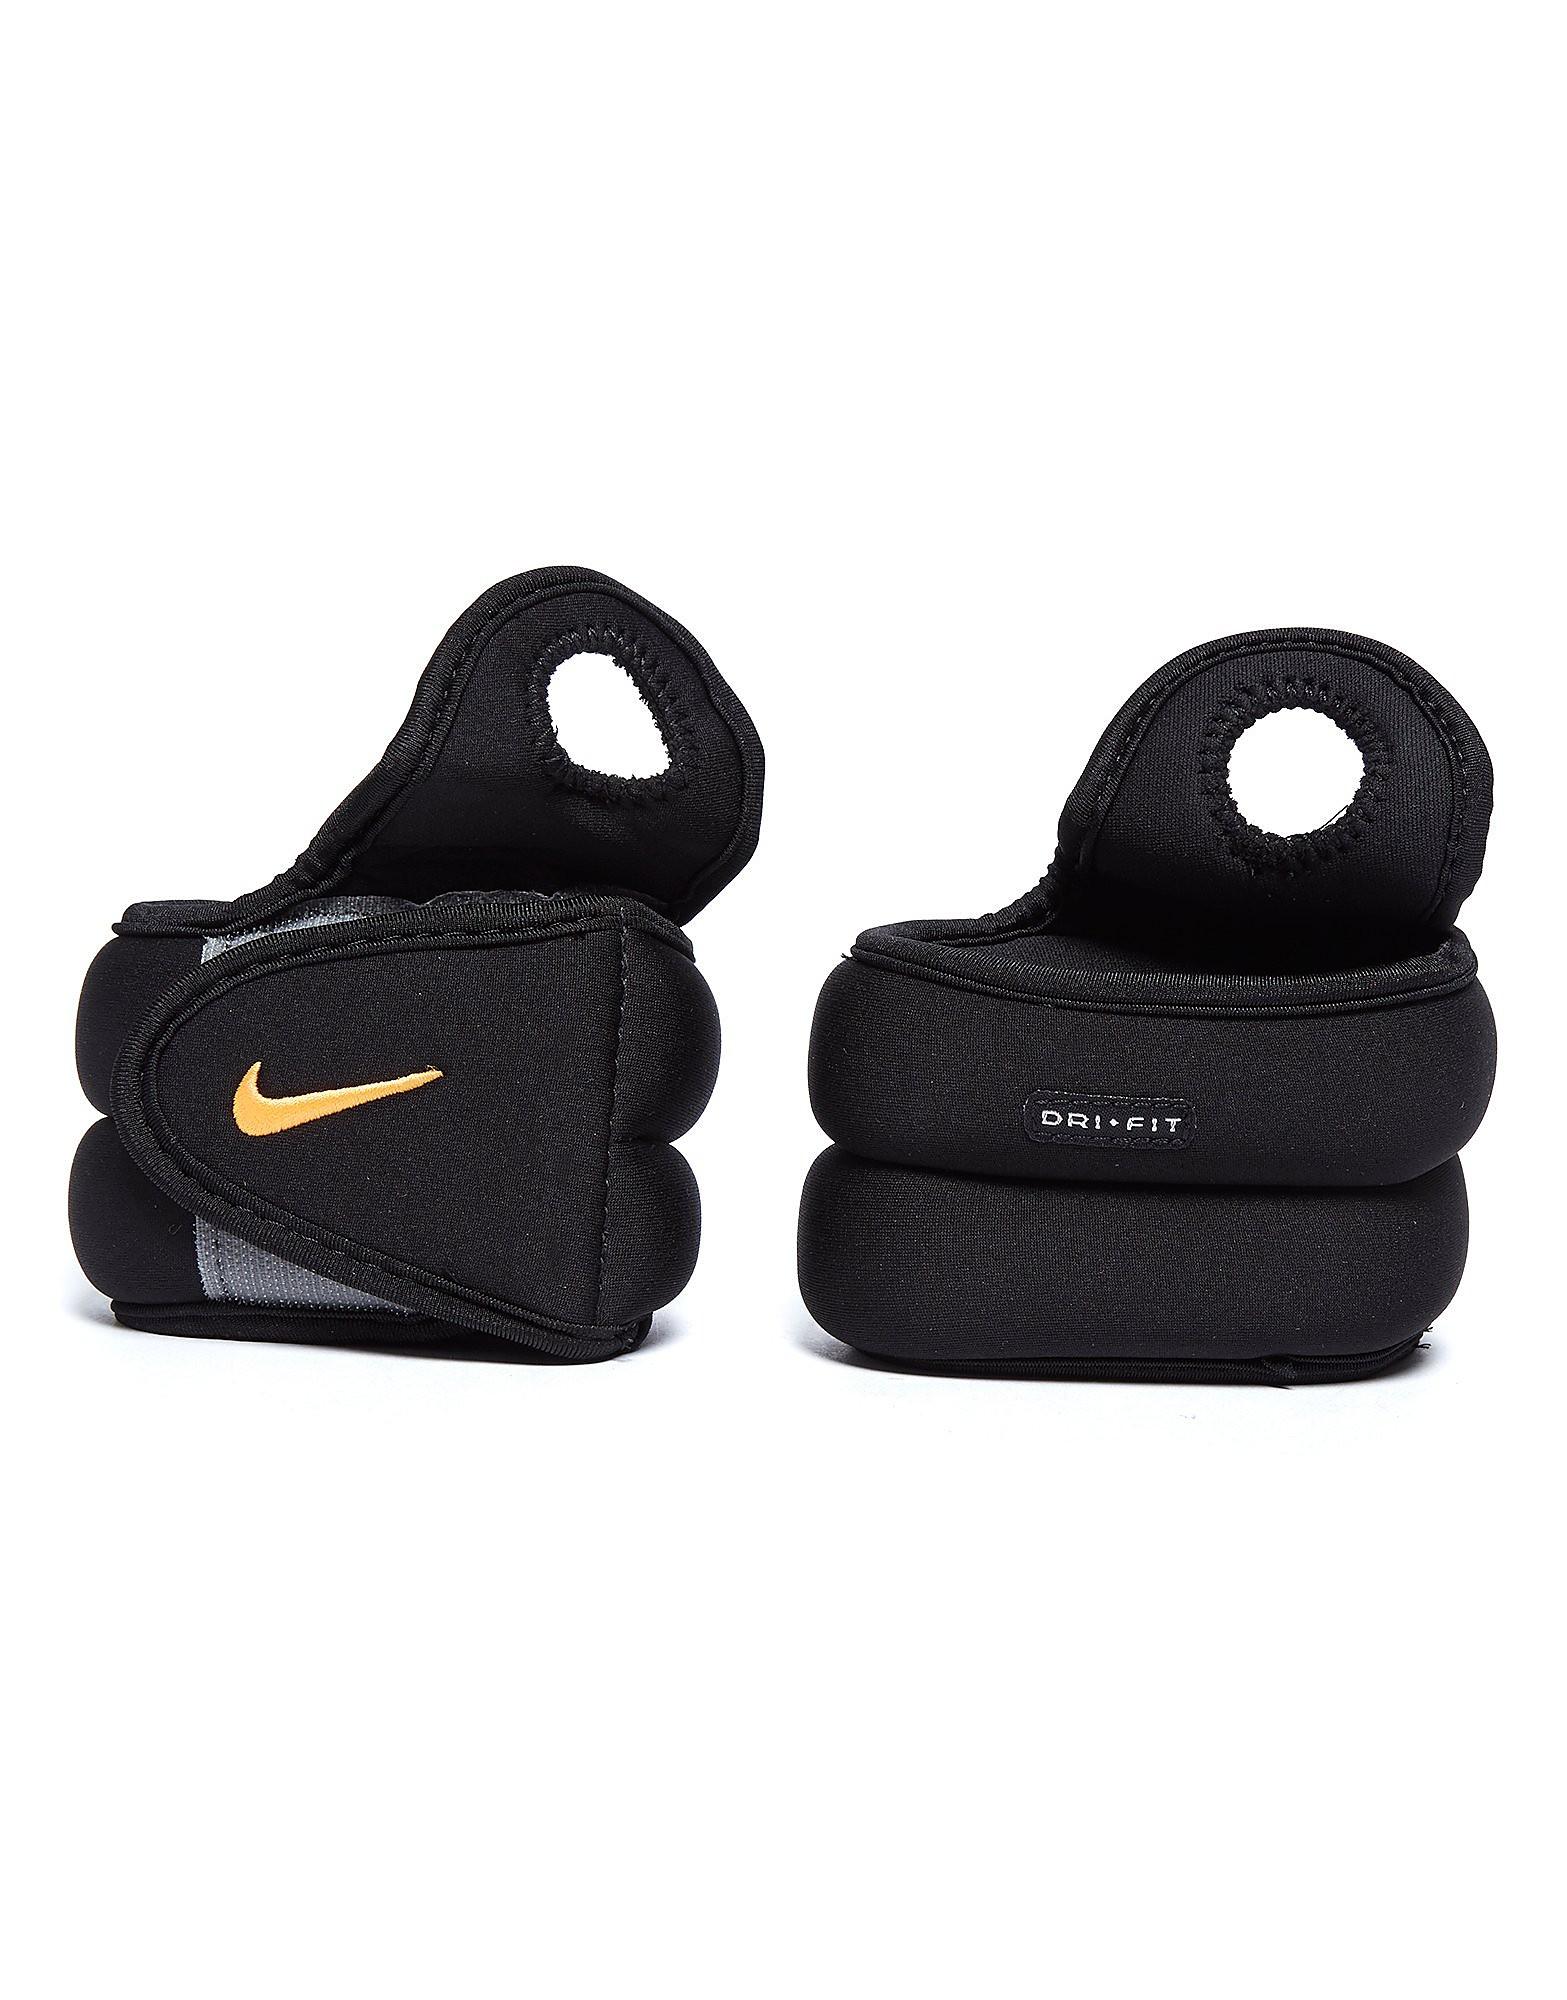 Nike 2.5LB Wrist Weights